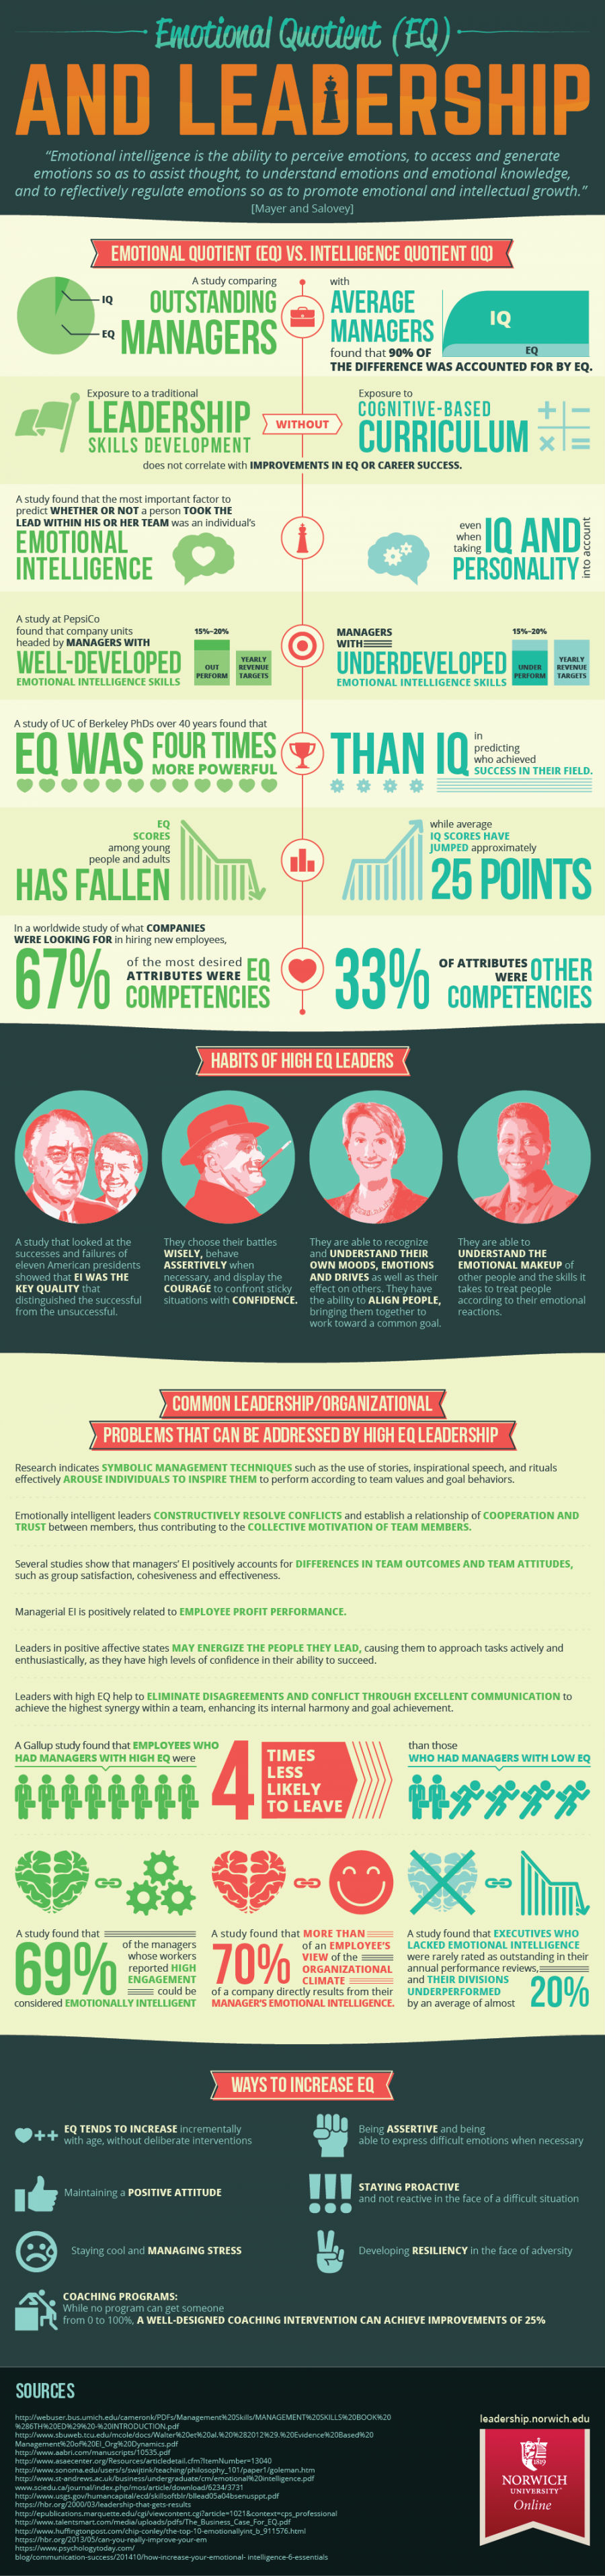 Emotional Intelligence and Leadership [Infographic]